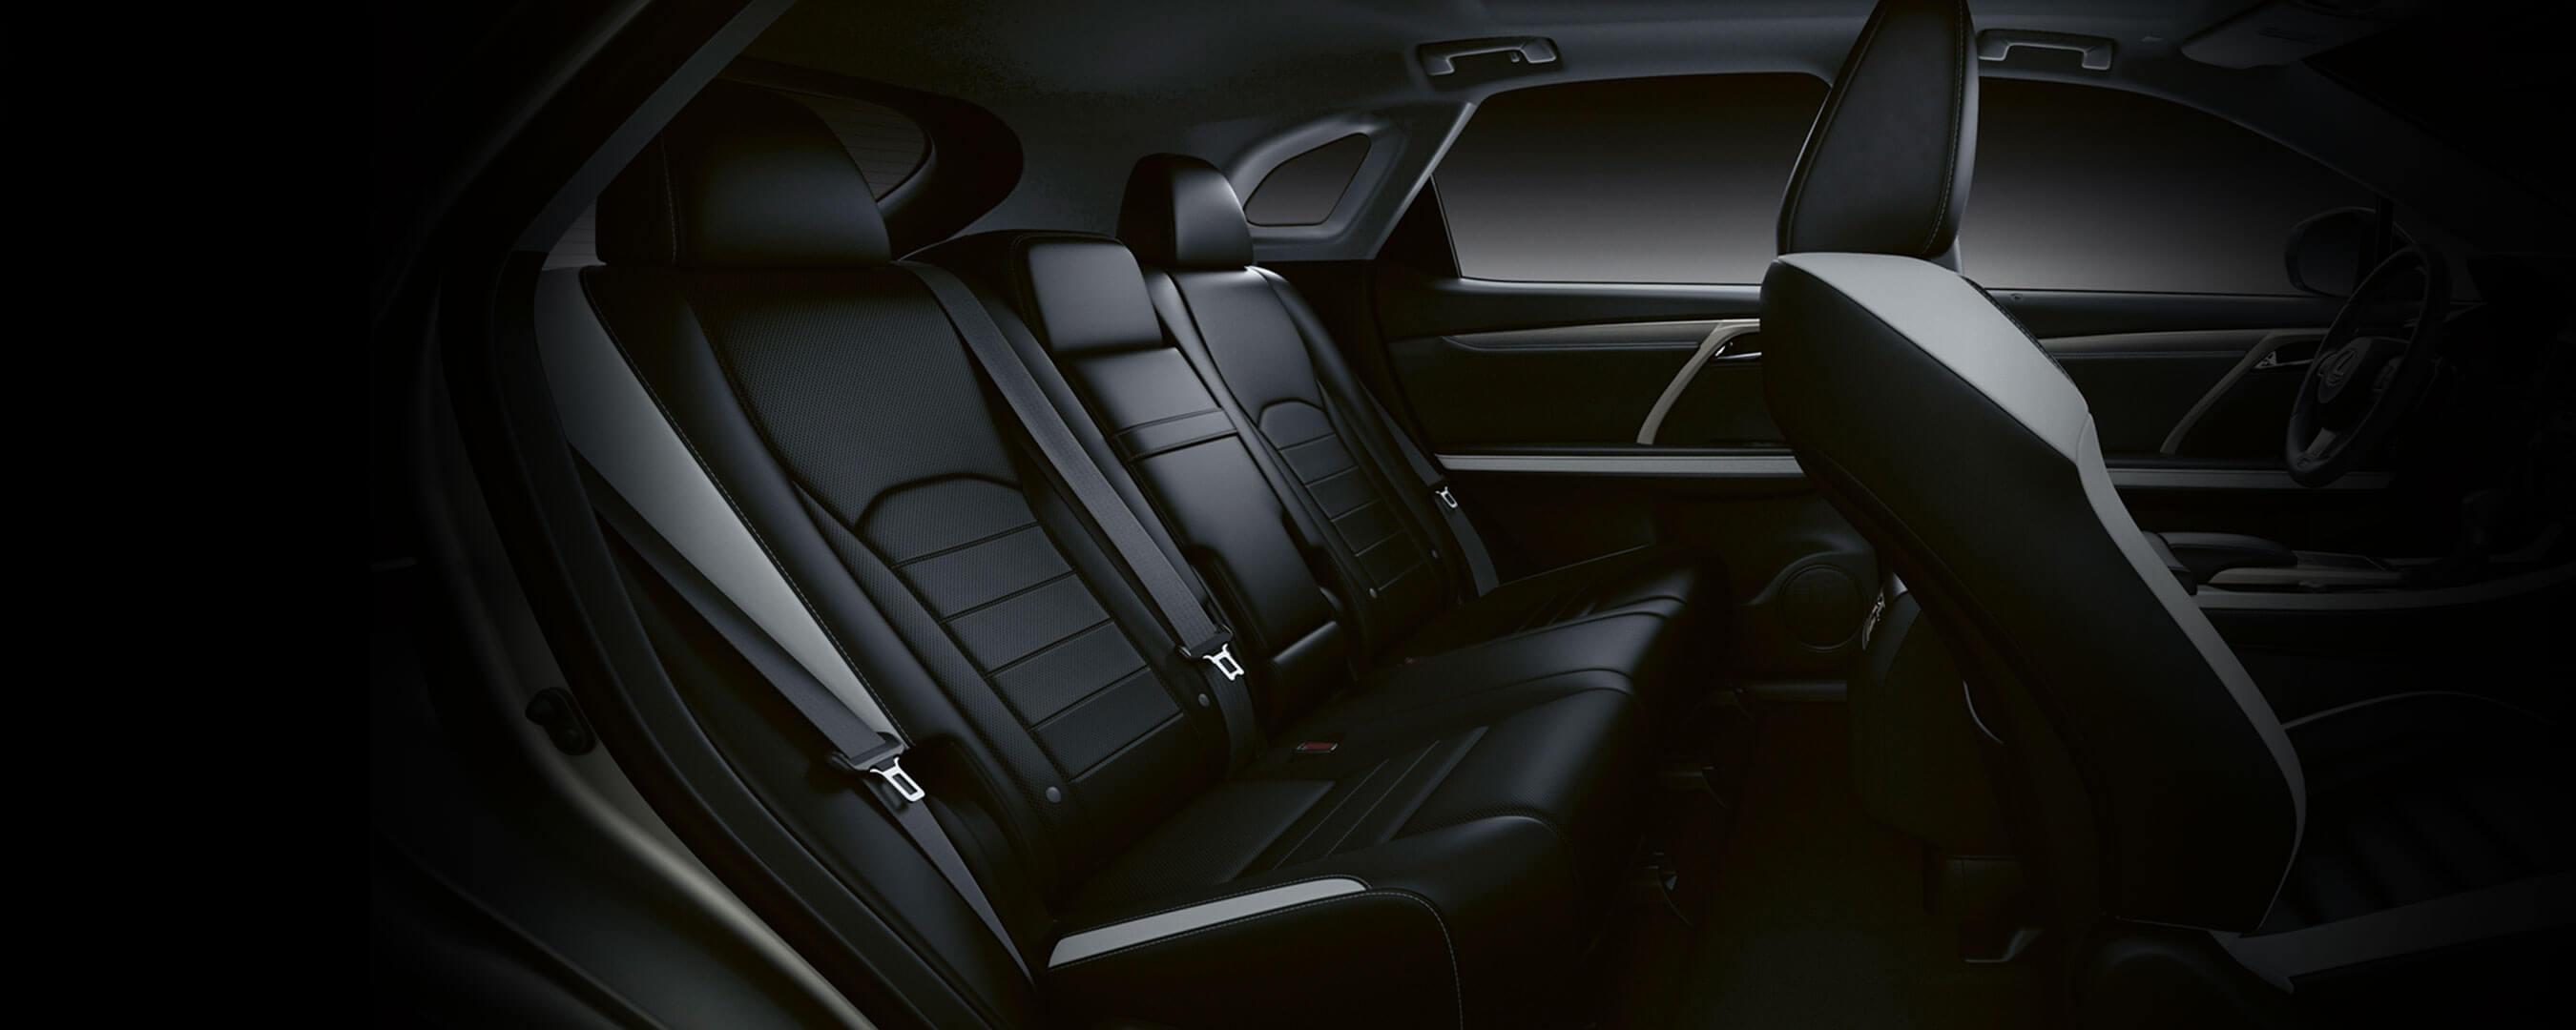 2019 lexus rx experience rear interior